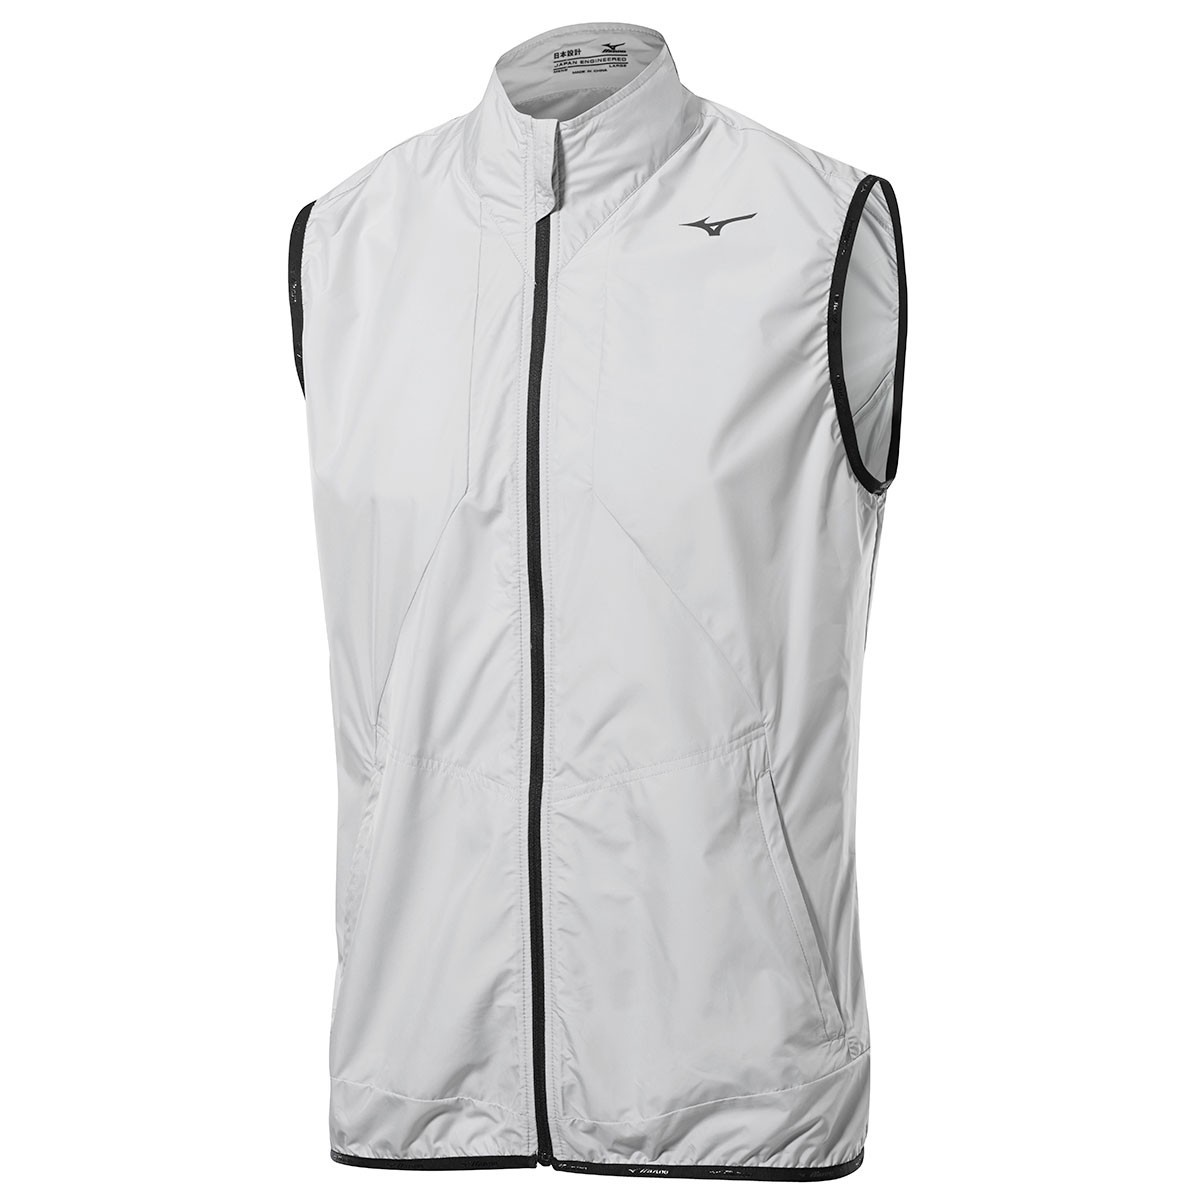 3554b7b137bbe Mizuno Golf Mens FZ Wind Vest Sleeveless Jacket - Golf Windproofs ...